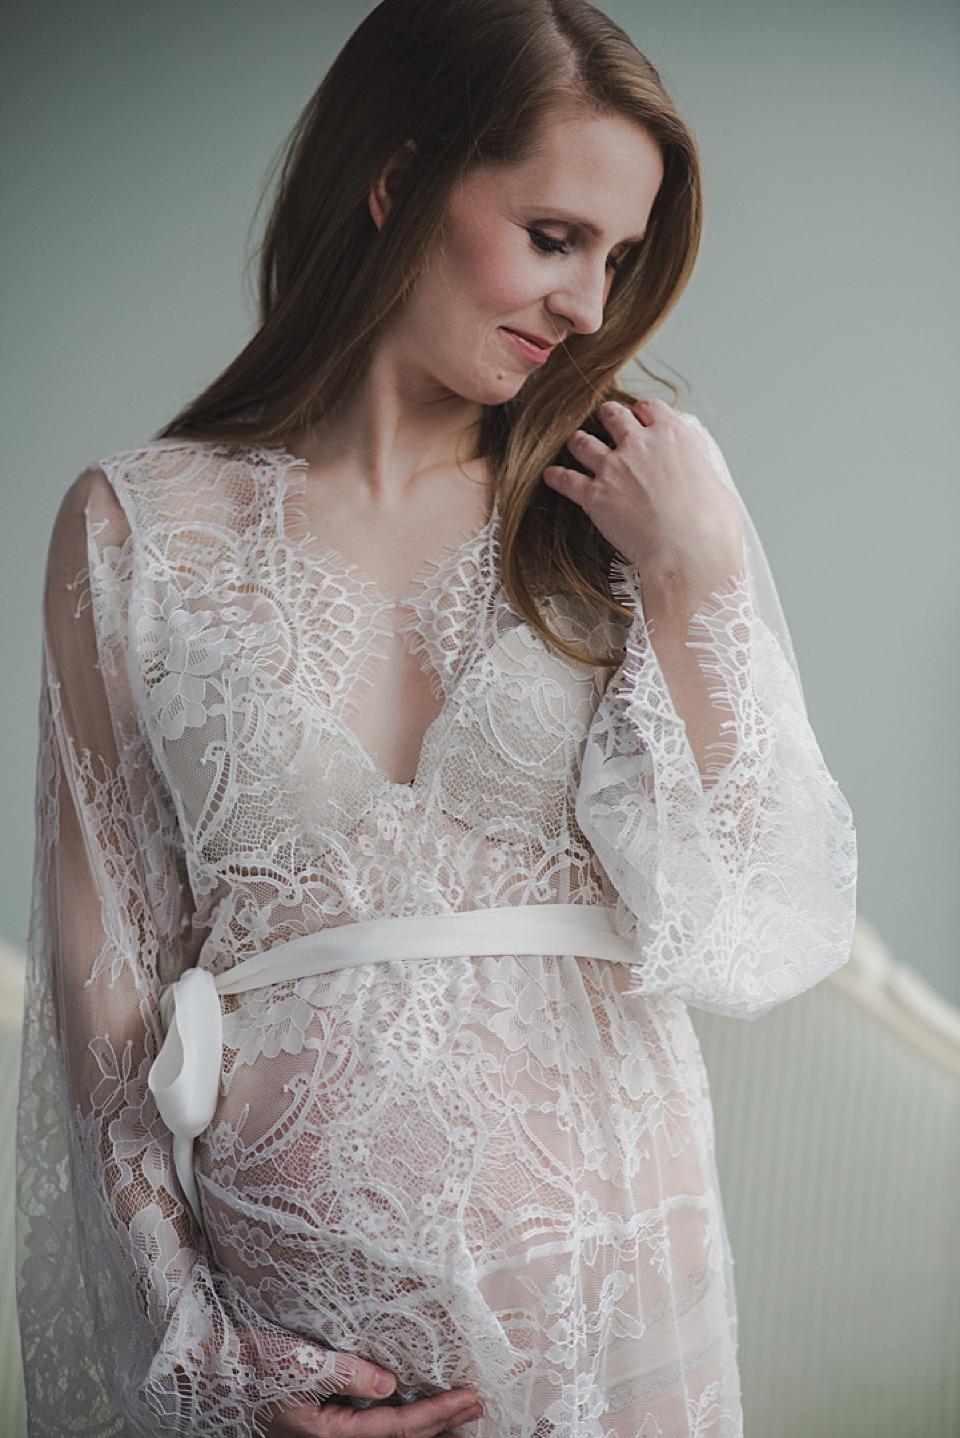 Toronto-Portrait-and-Wedding-Photographer-Alisha-Lynn-Photography_1063.jpg